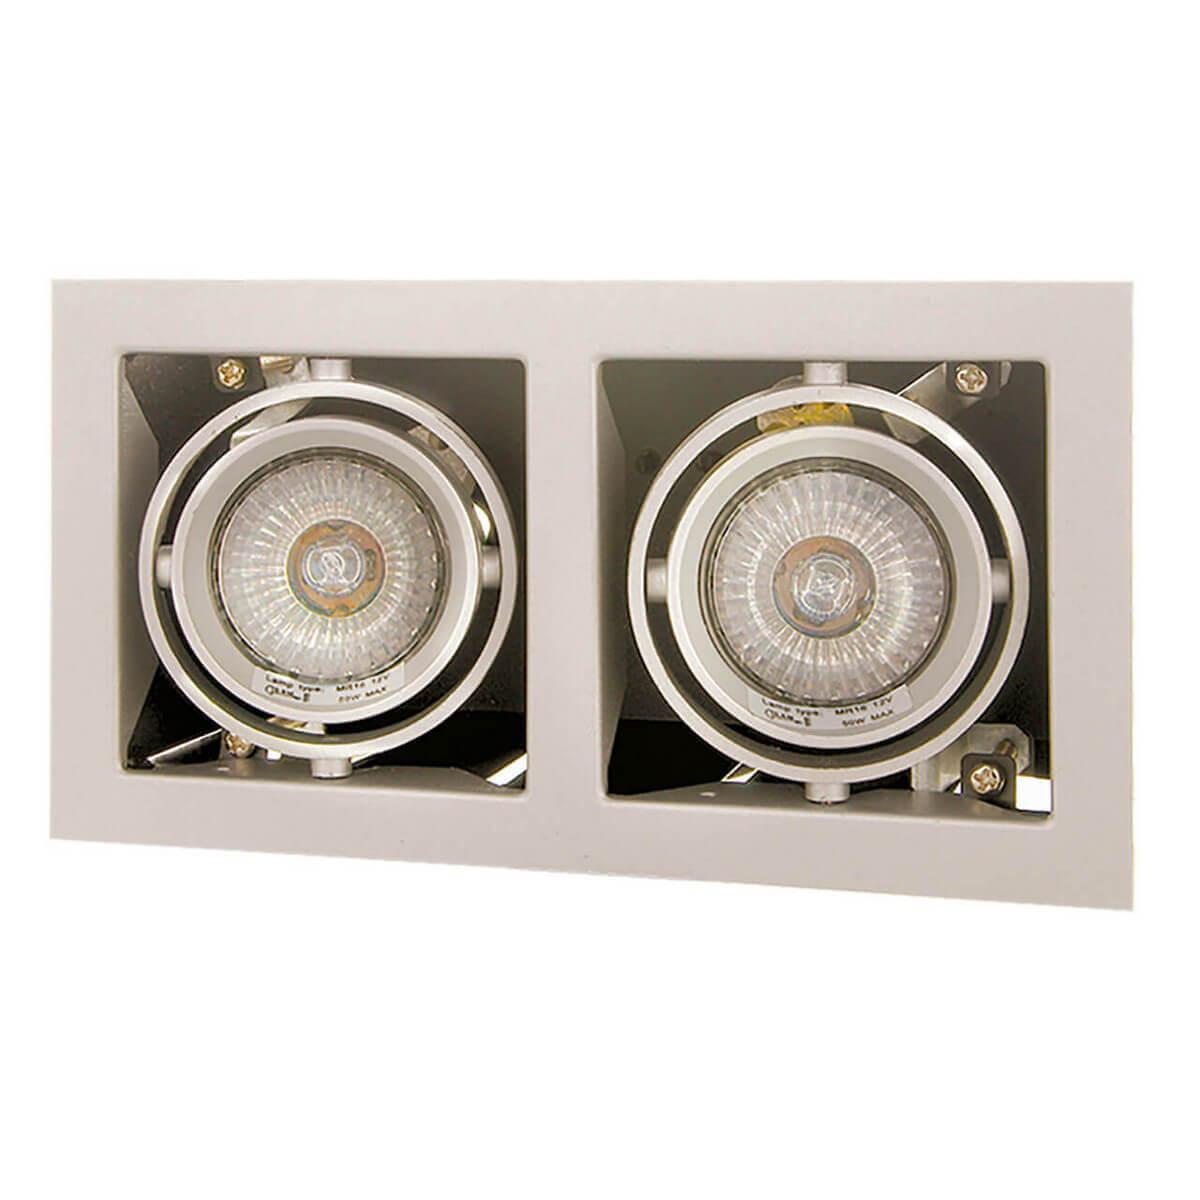 Светильник Lightstar 214027 Cardano встраиваемый светильник lightstar cardano 214130